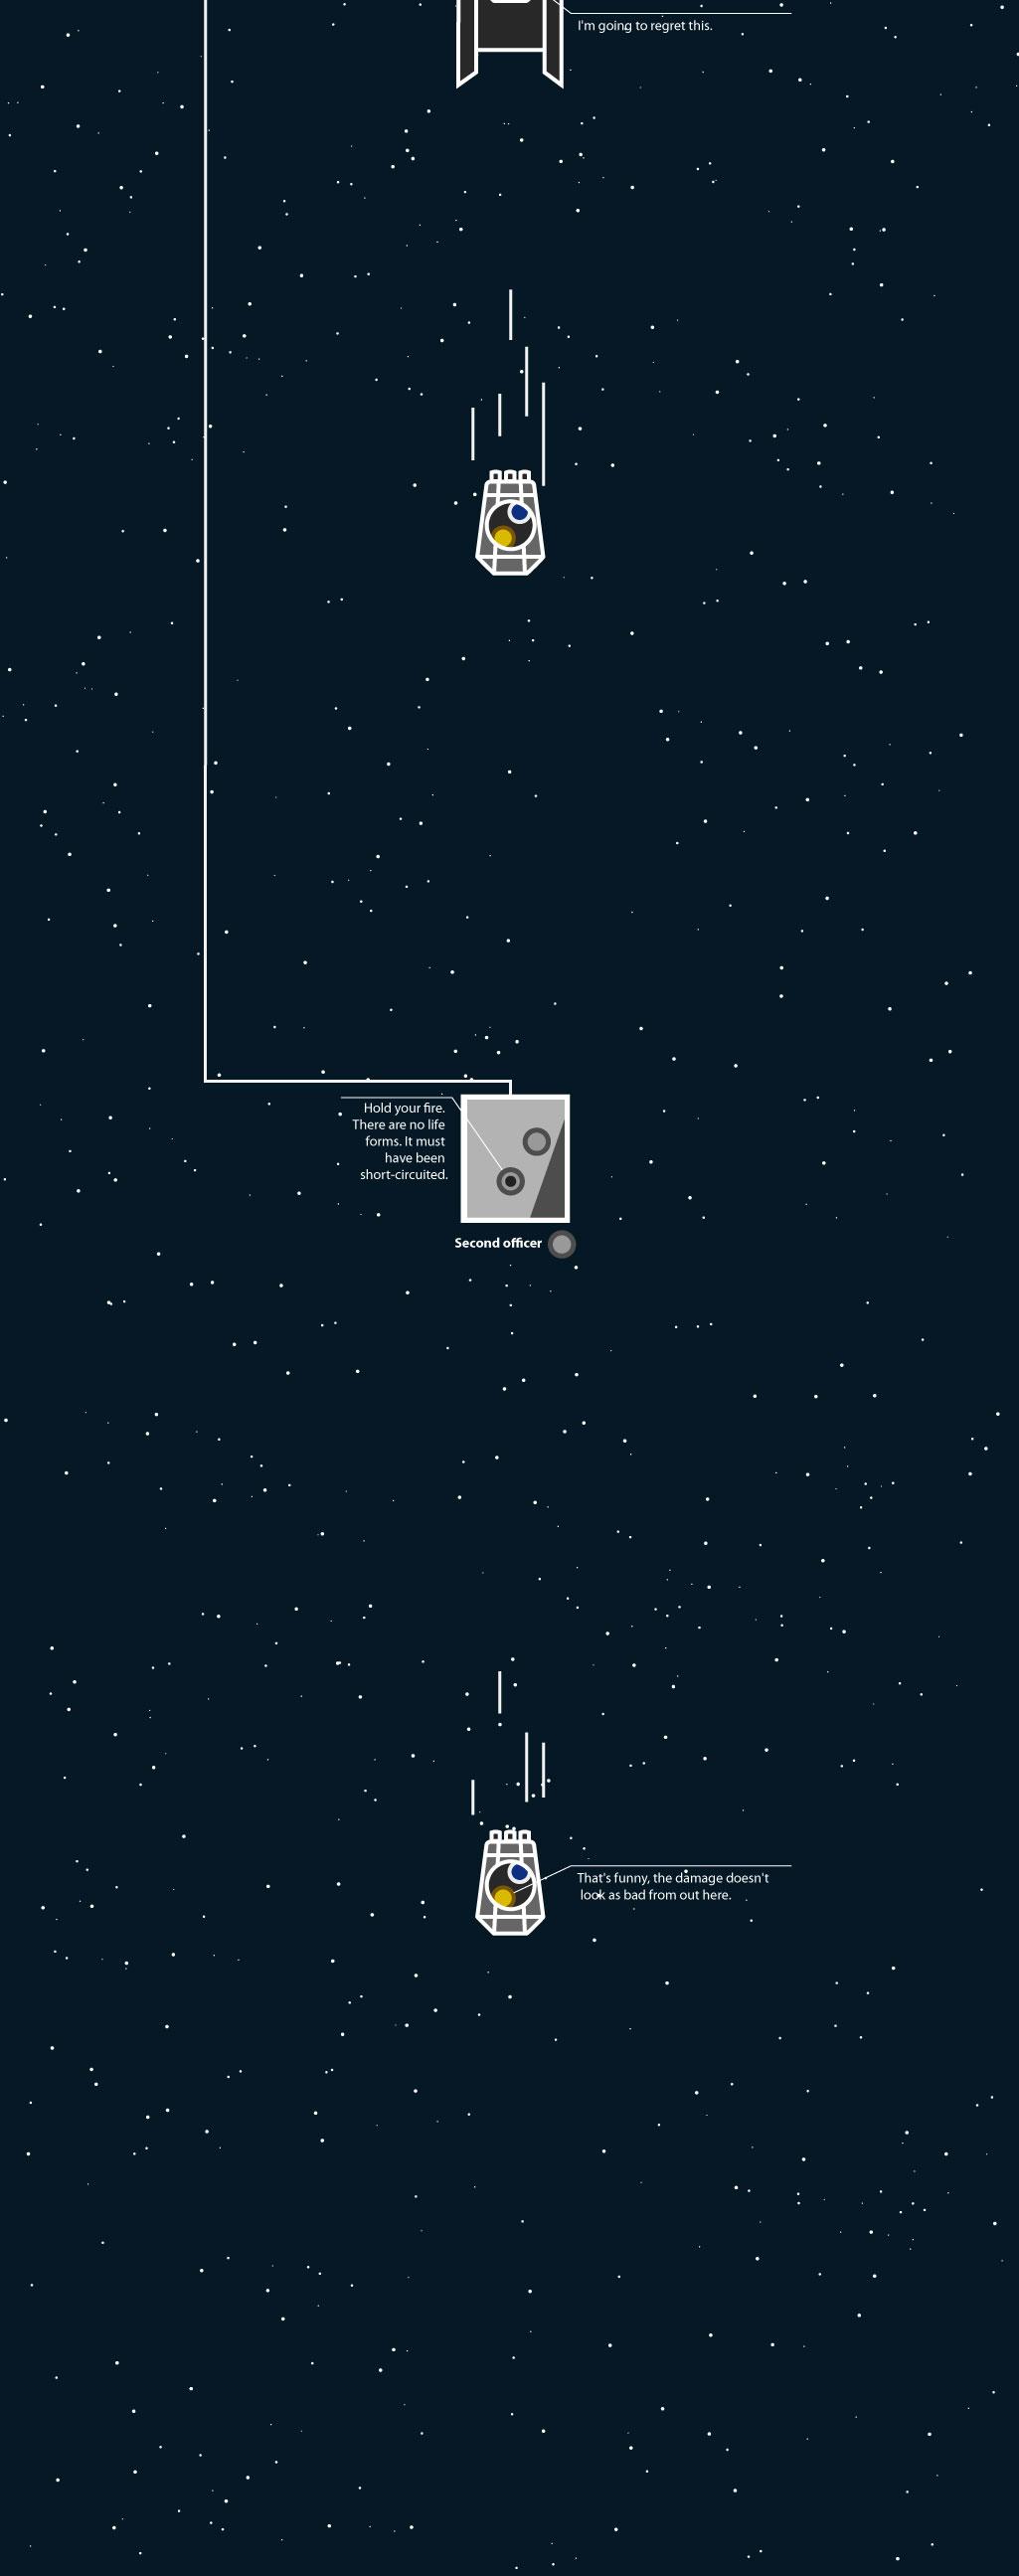 4-Martin-Panchaud-star-wars-histoire